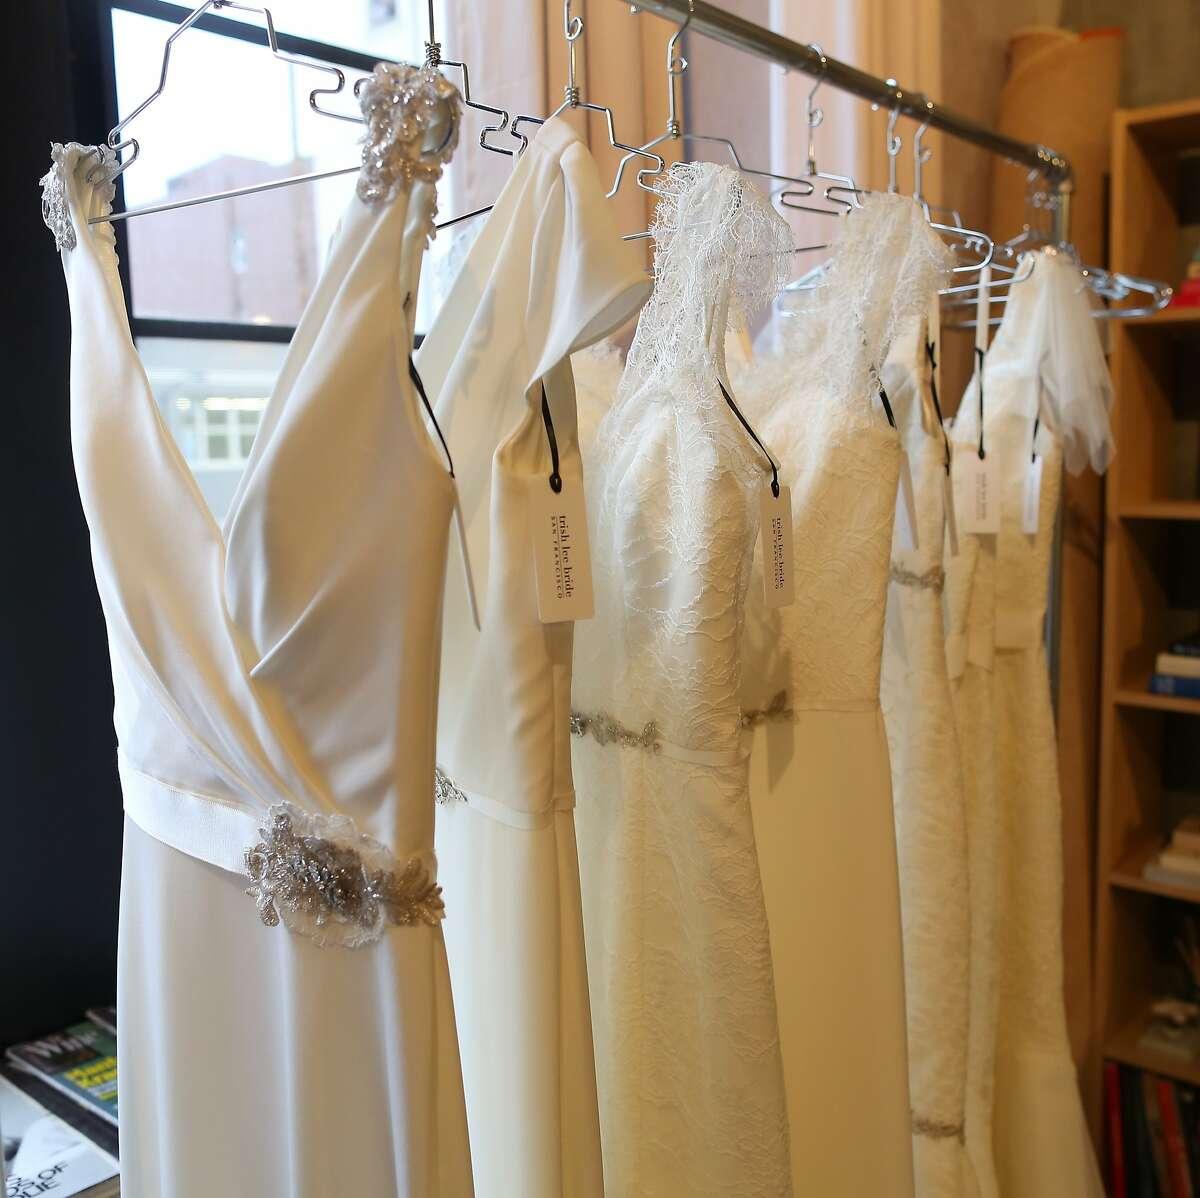 Trish Lee is a new San Francisco bridal gown designer.